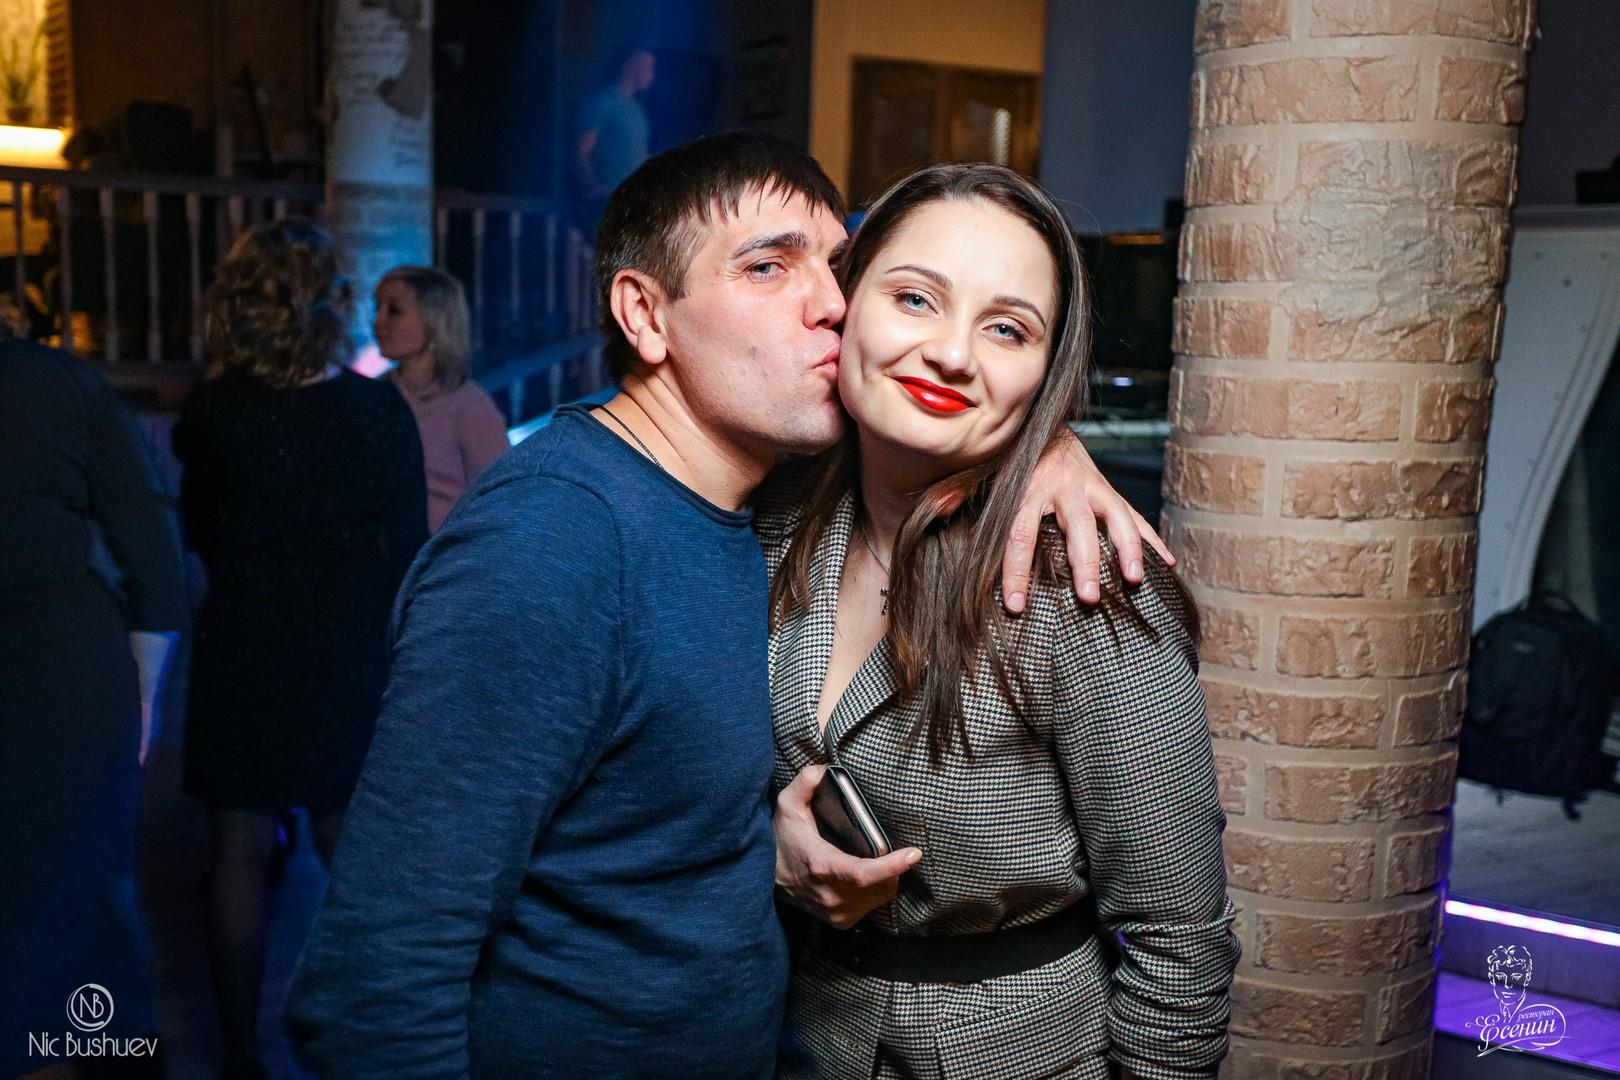 Ресторан Орехово-Зуево Есенин 14_02_2020 (9)